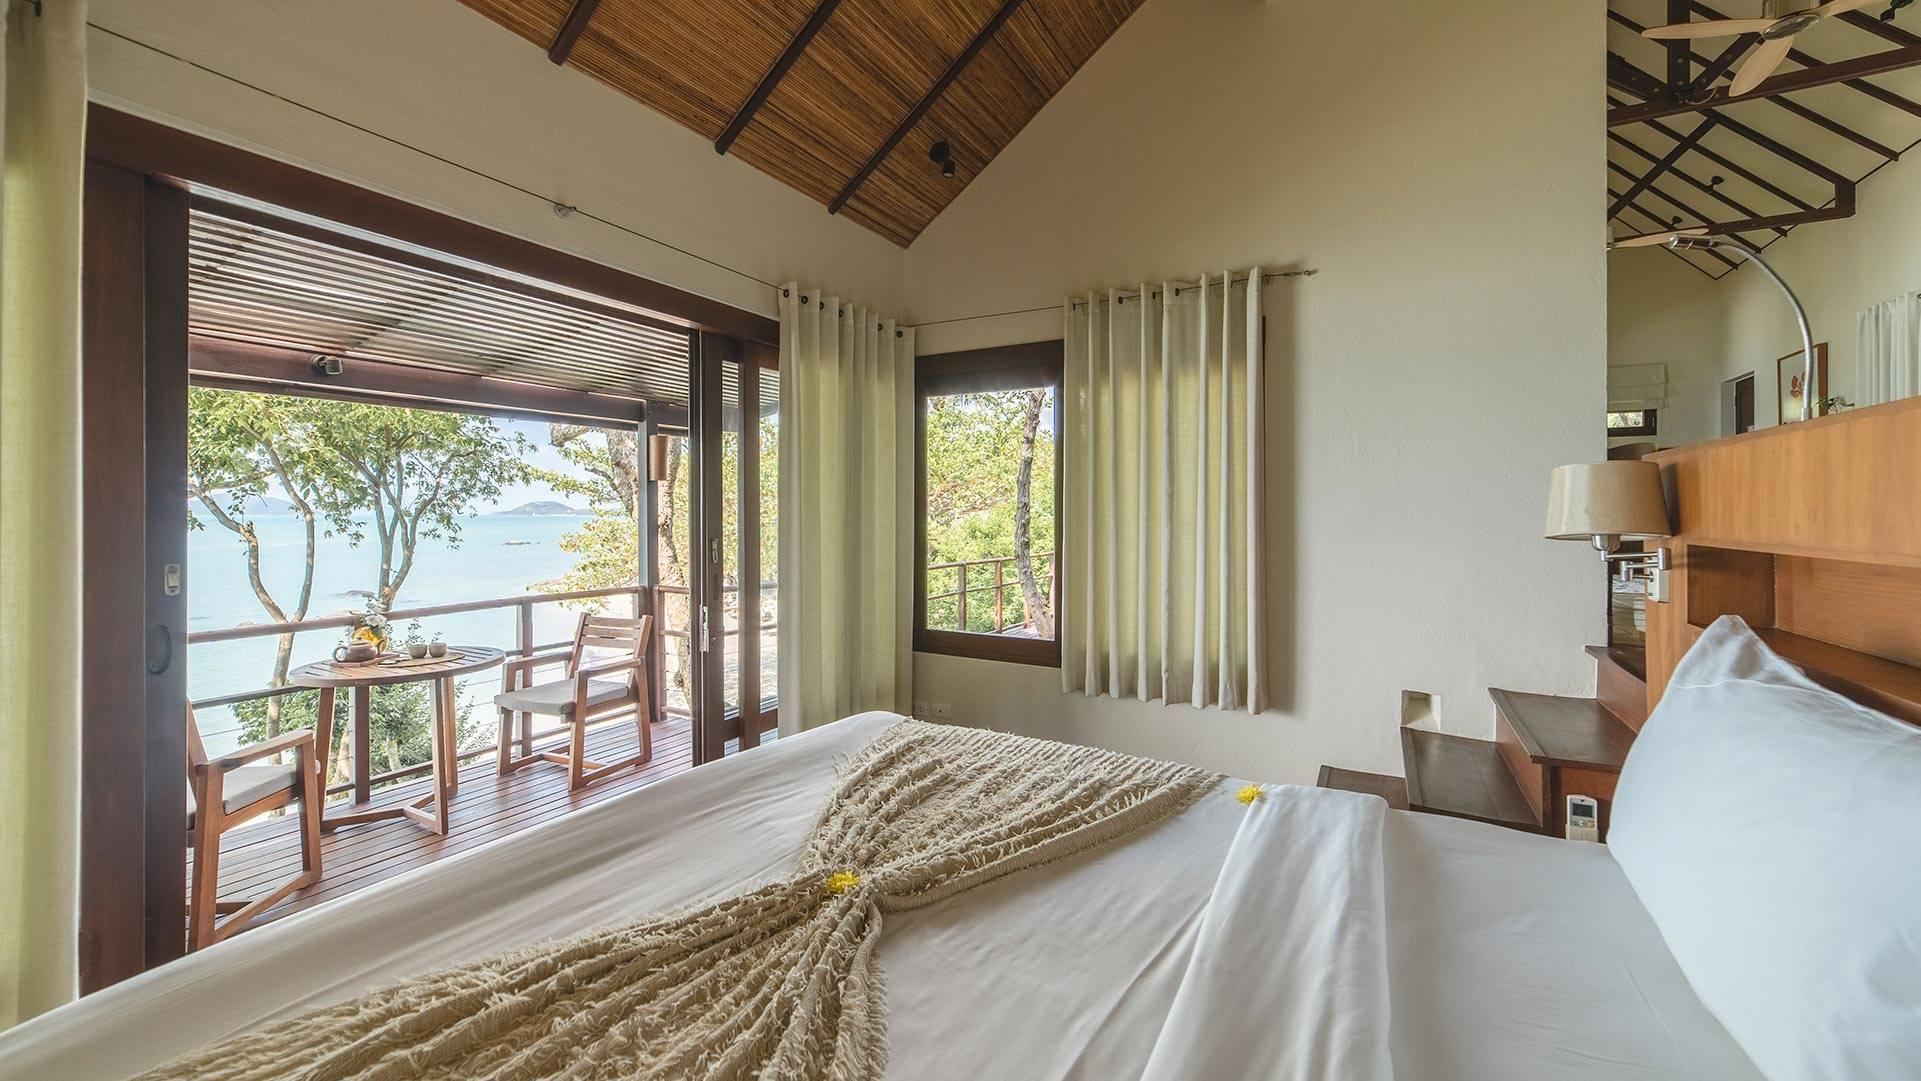 Private Bunglow with Private Beach in Koh Samui Thailand